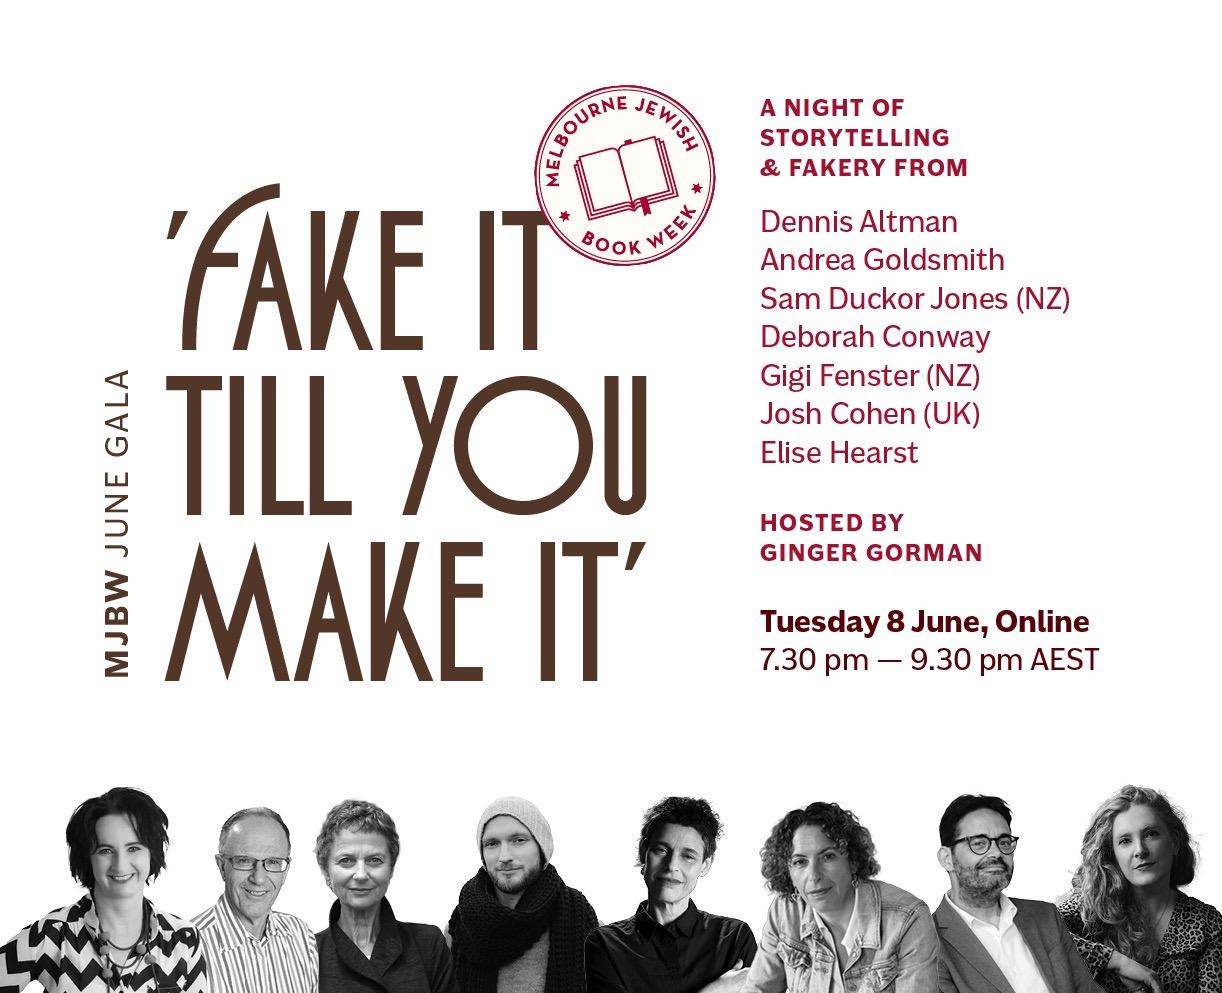 Melbourne Jewish Book Week Gala - Fake It Till You Make It